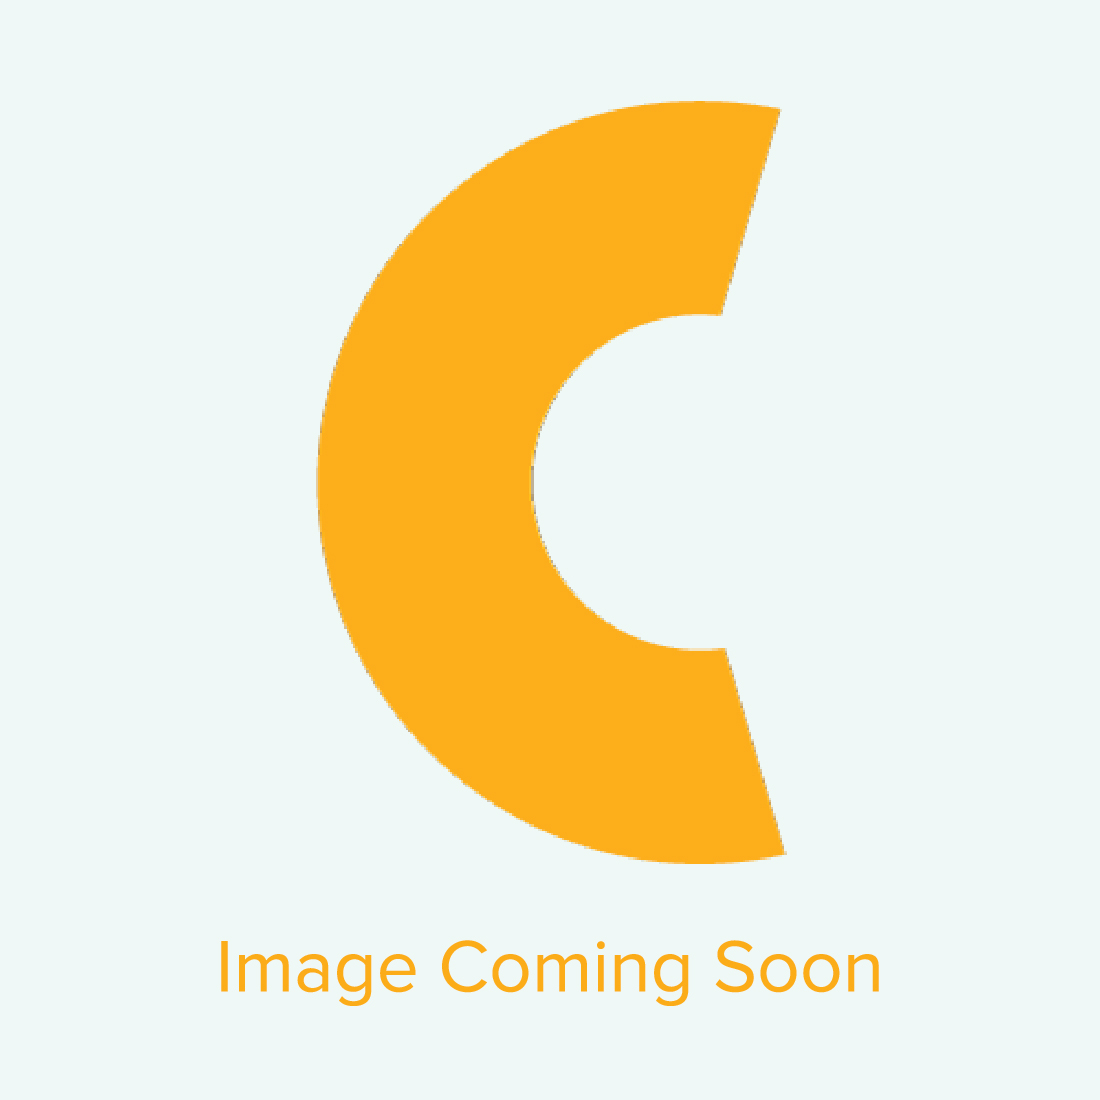 Coil Binding - 12